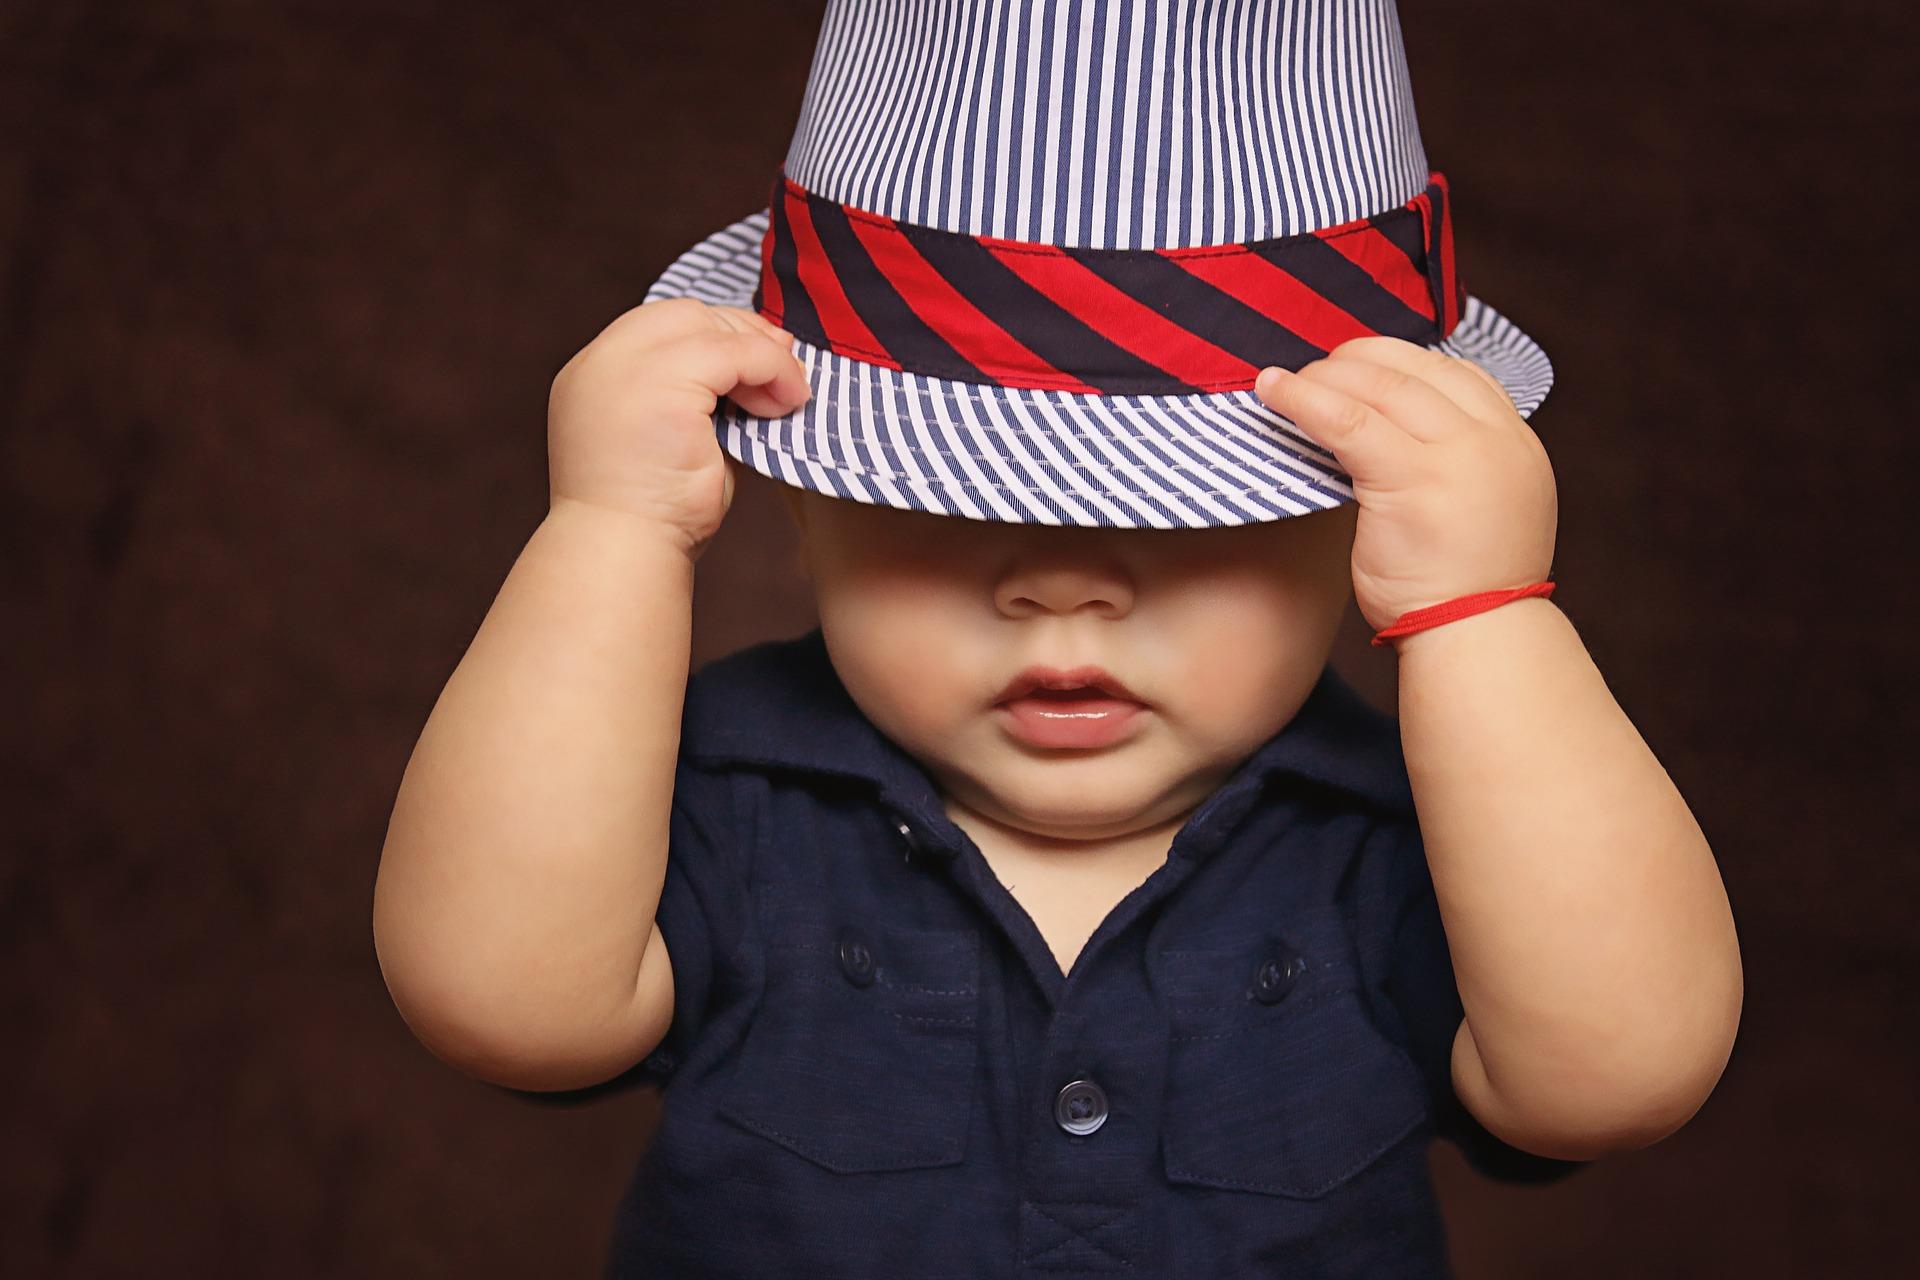 baby-1399332_1920.jpg